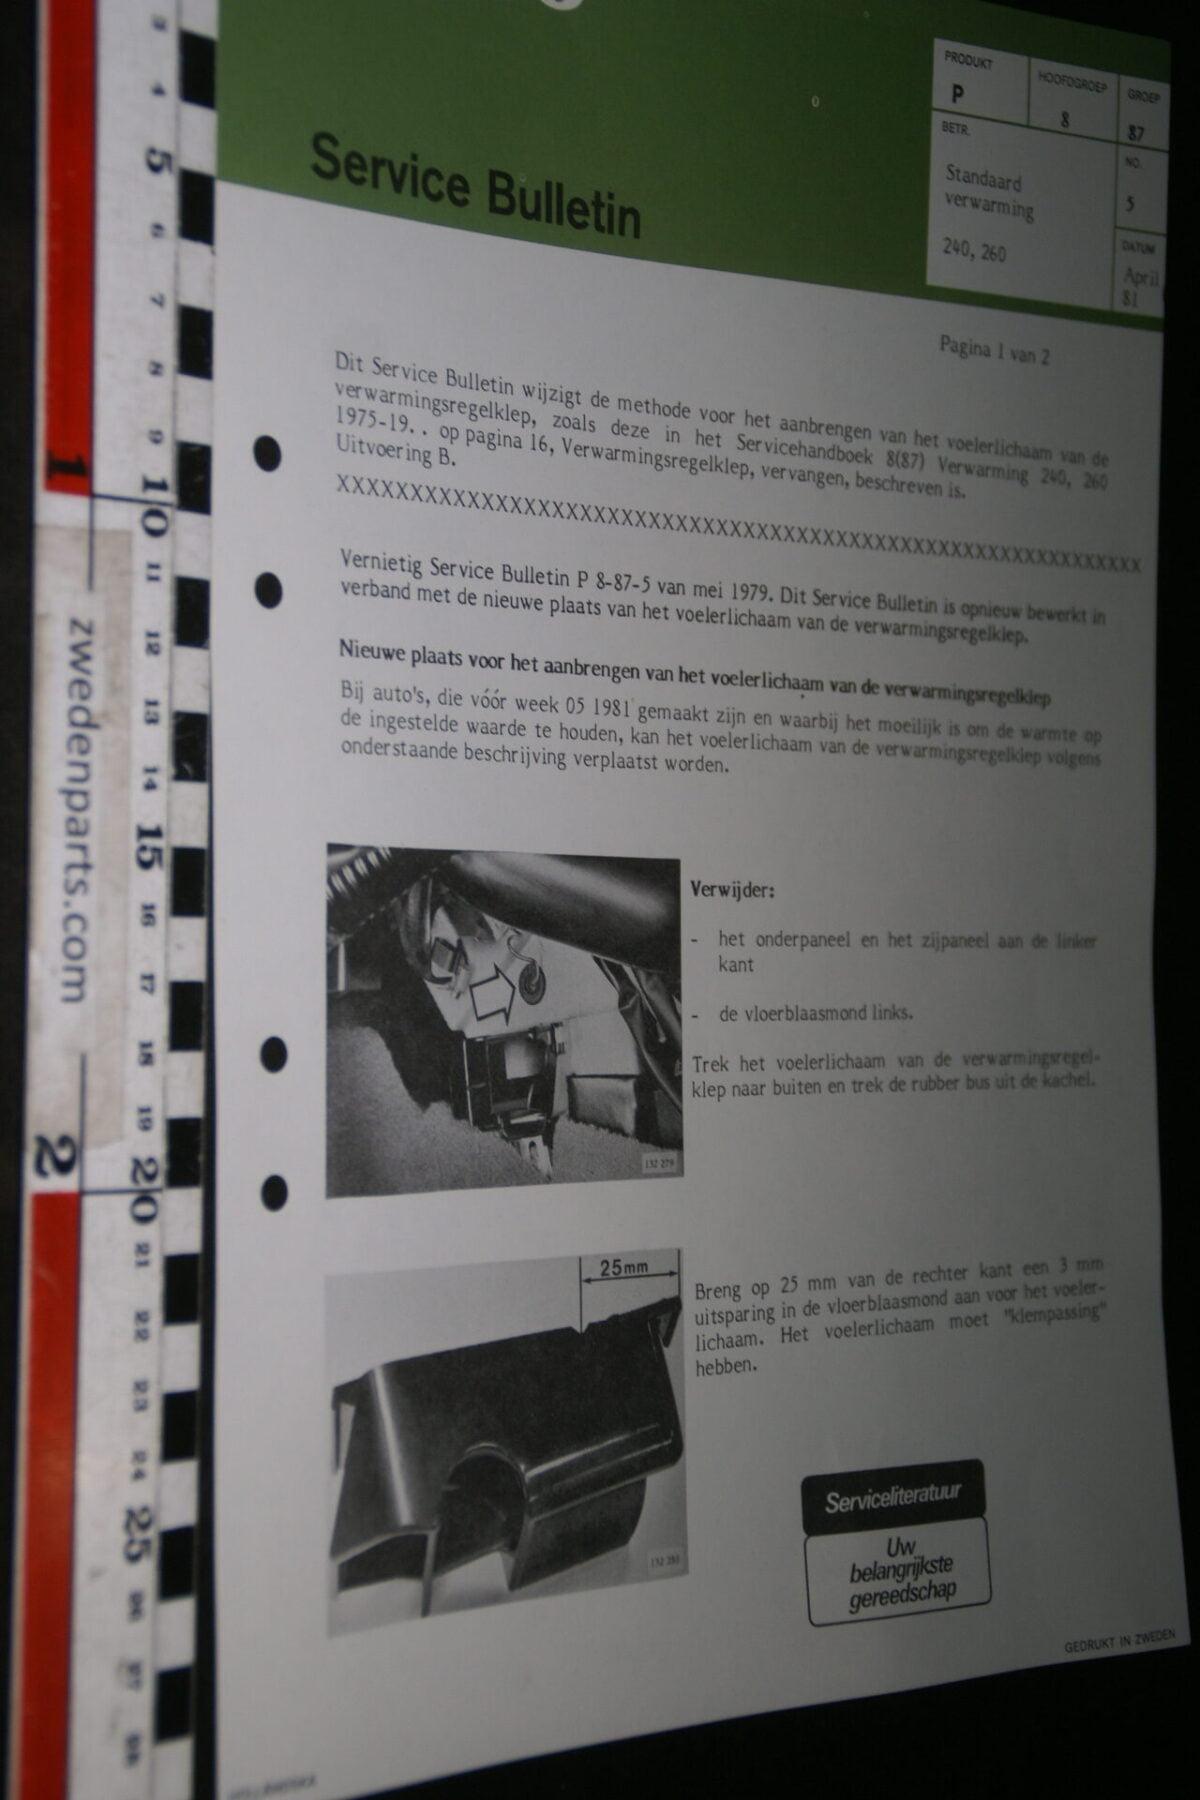 DSC07667 1981 origineel Volvo 240 260 werkplaatsboek servicebulletin 8-87 standaard verwarming-5da3aa0e